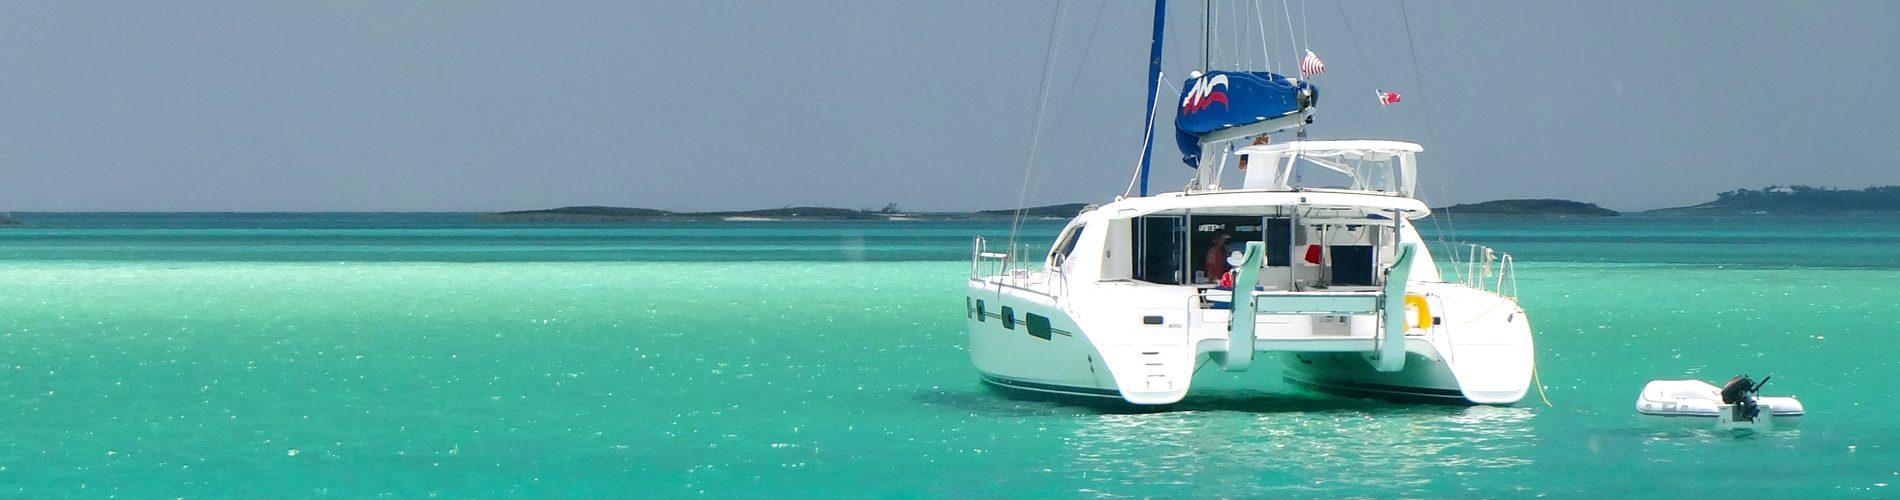 Catamaran-header